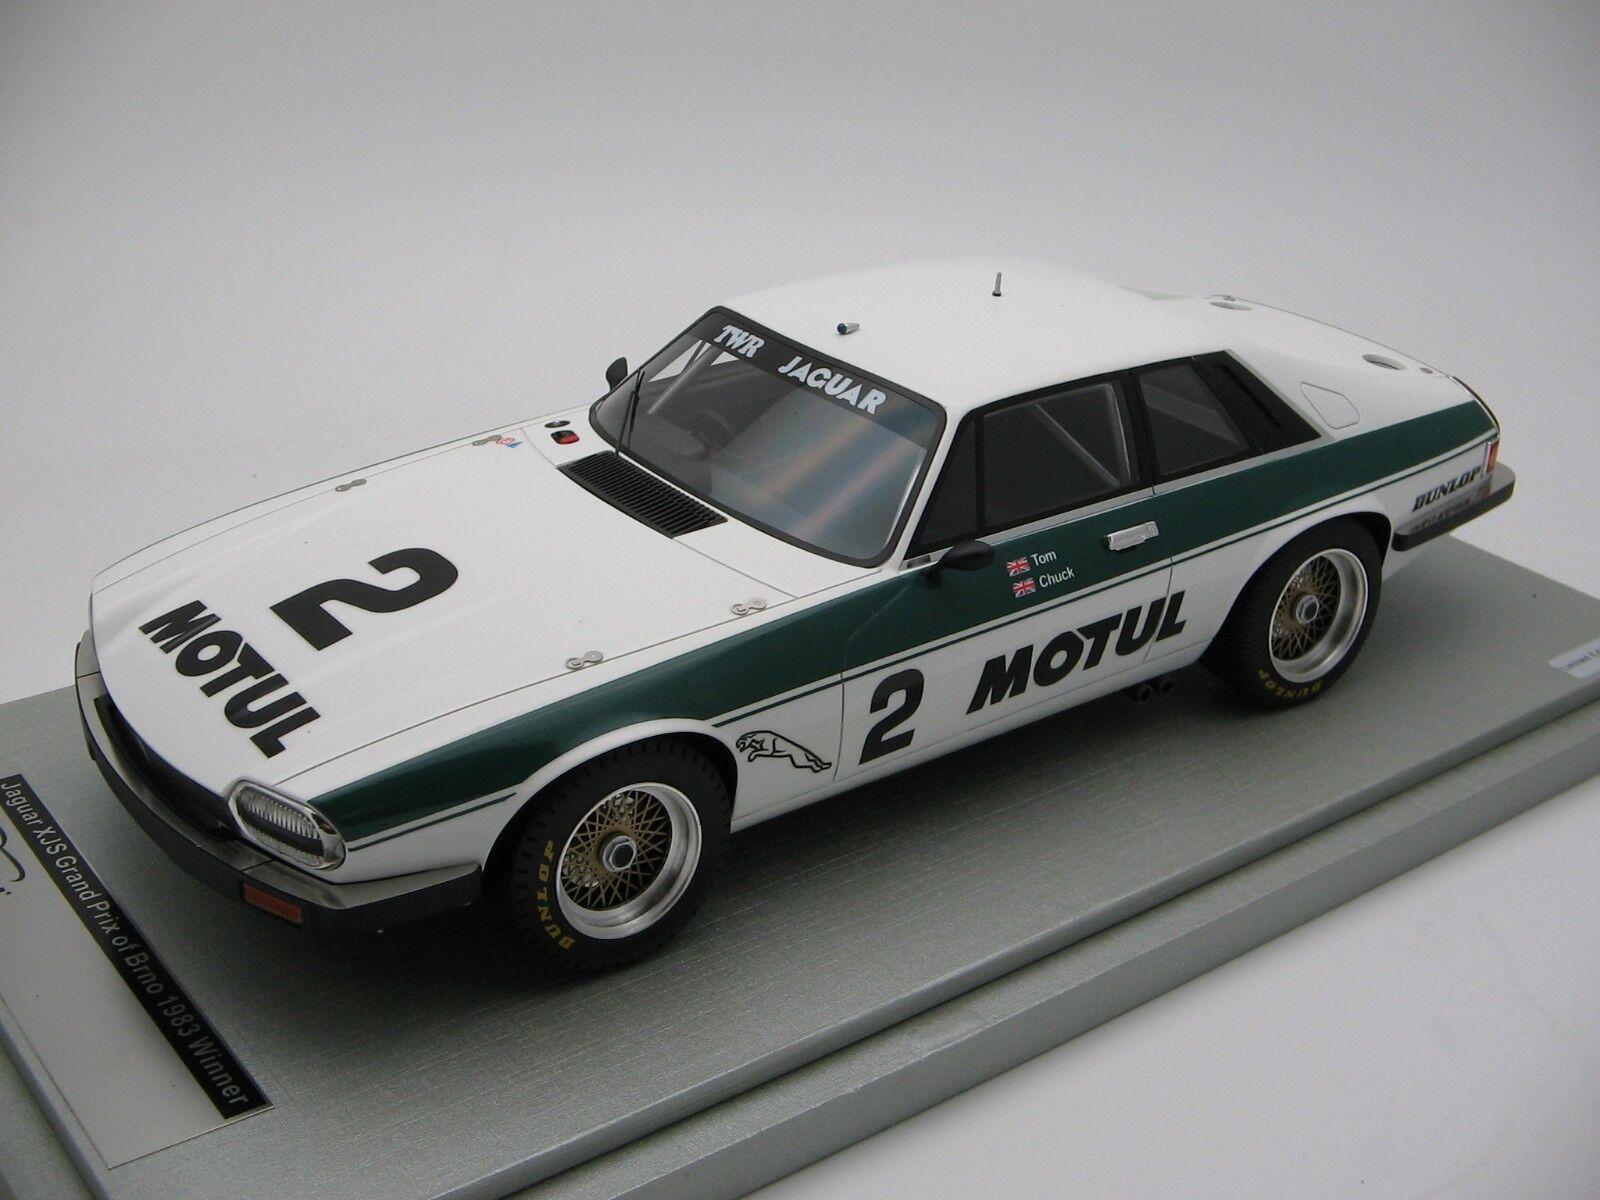 1/18 scale Tecnomodel Jaguar XJ-S Grand Prix di Brno 1983 - TM18-107C